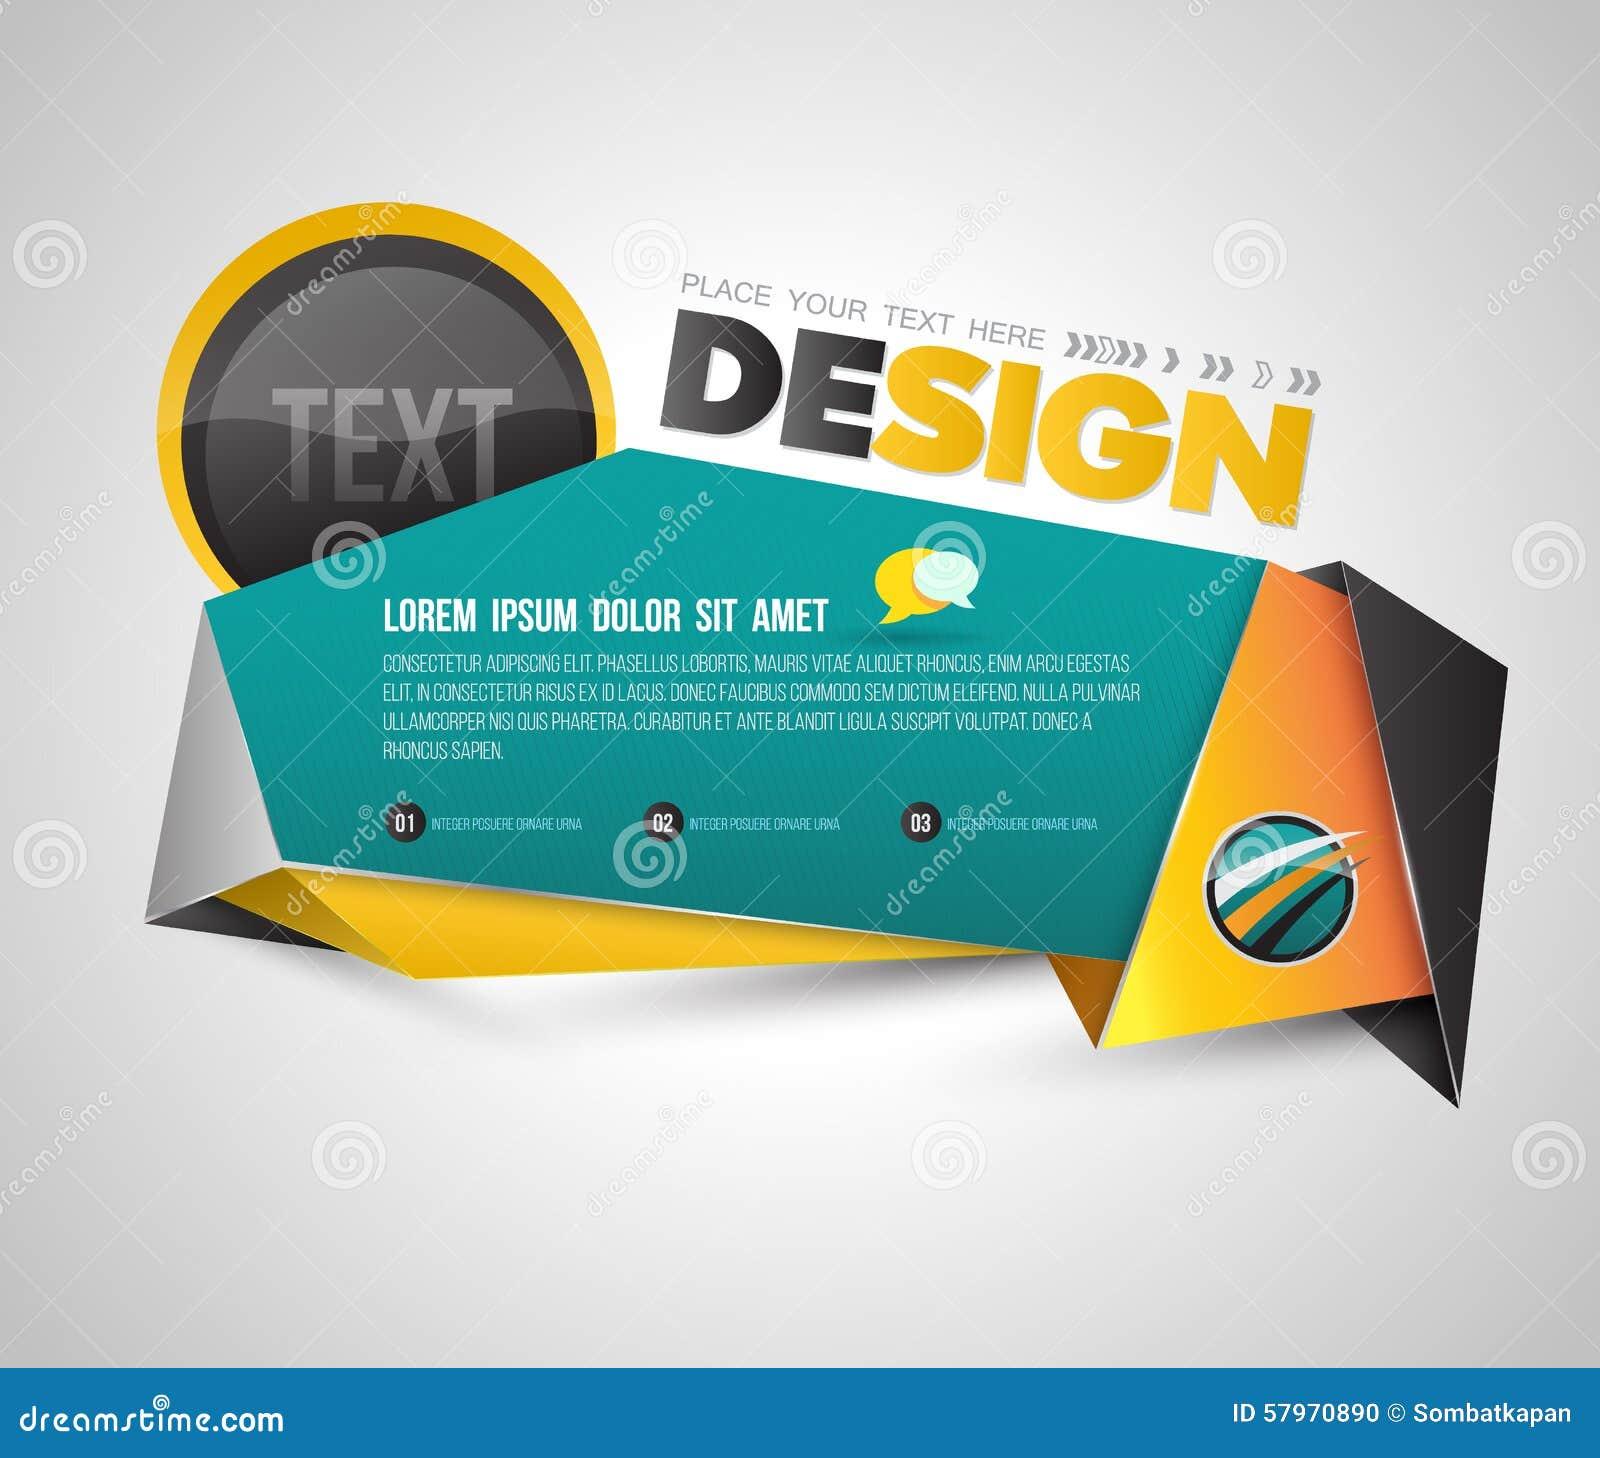 Modern Banner Origami 3D Style. Stock Vector ...